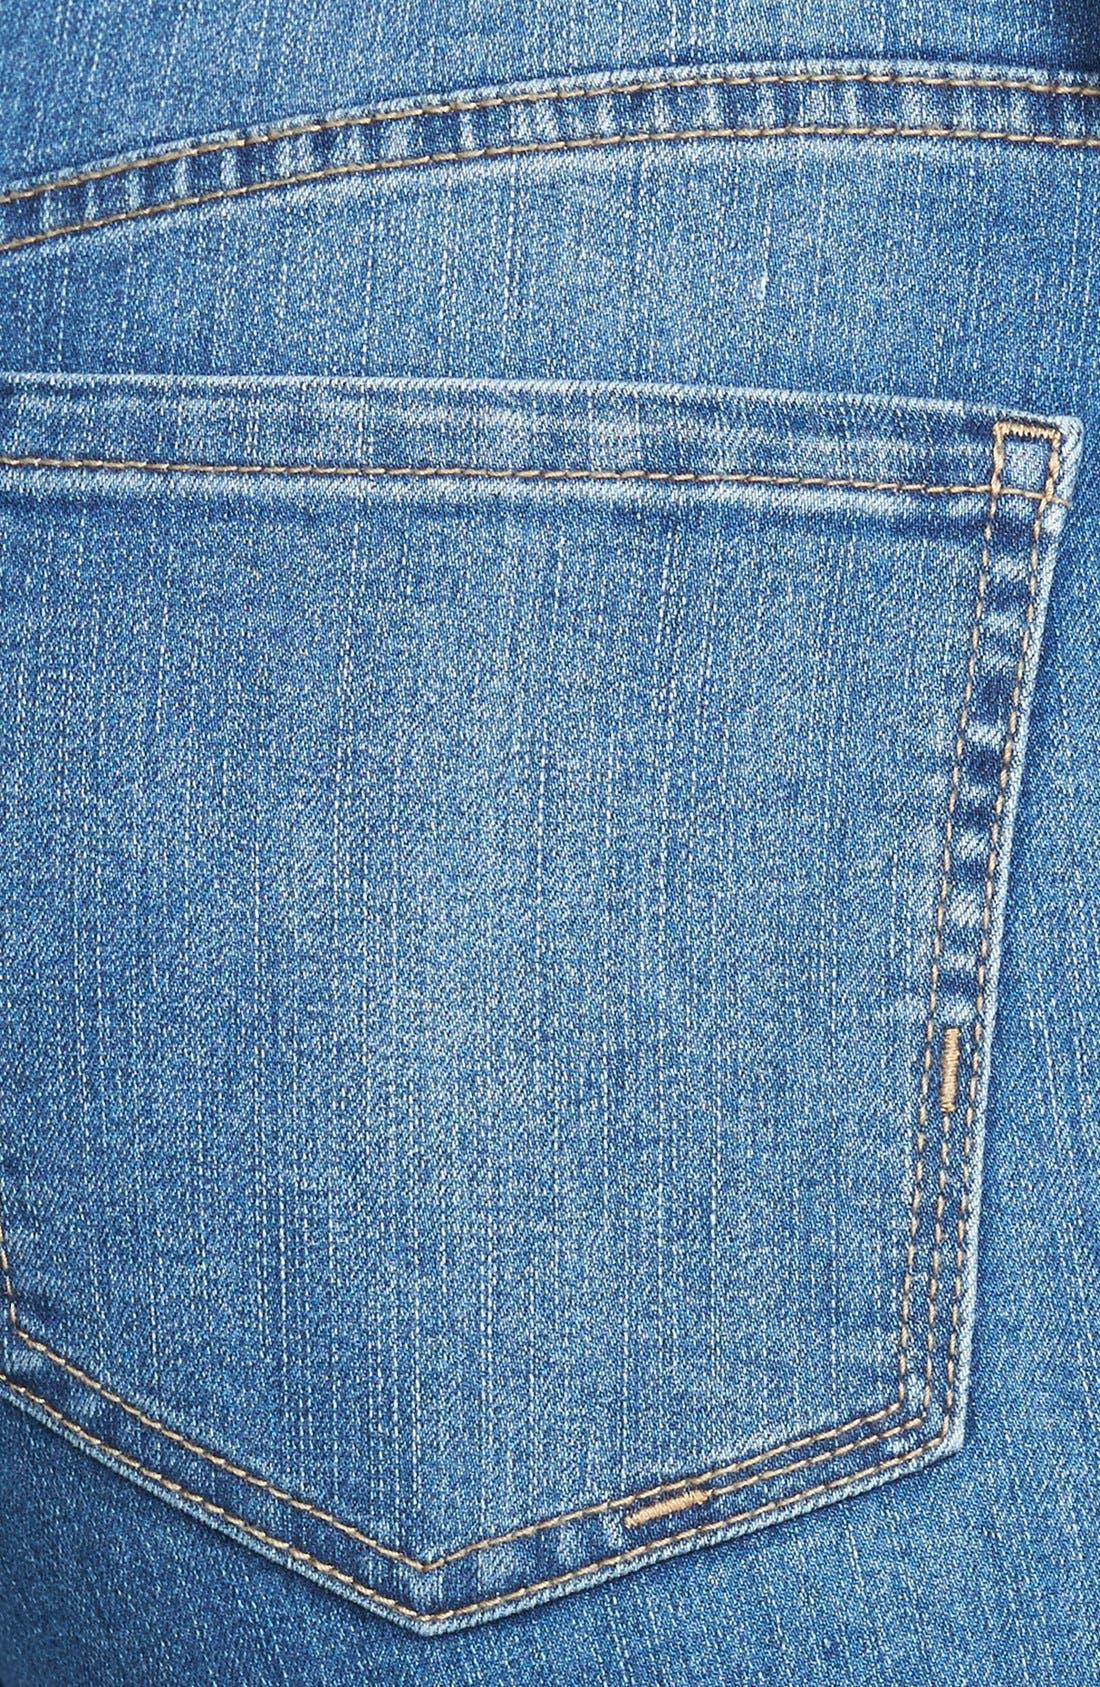 Alternate Image 3  - Liverpool Jeans Company 'Sadie' Straight Leg Stretch Jeans